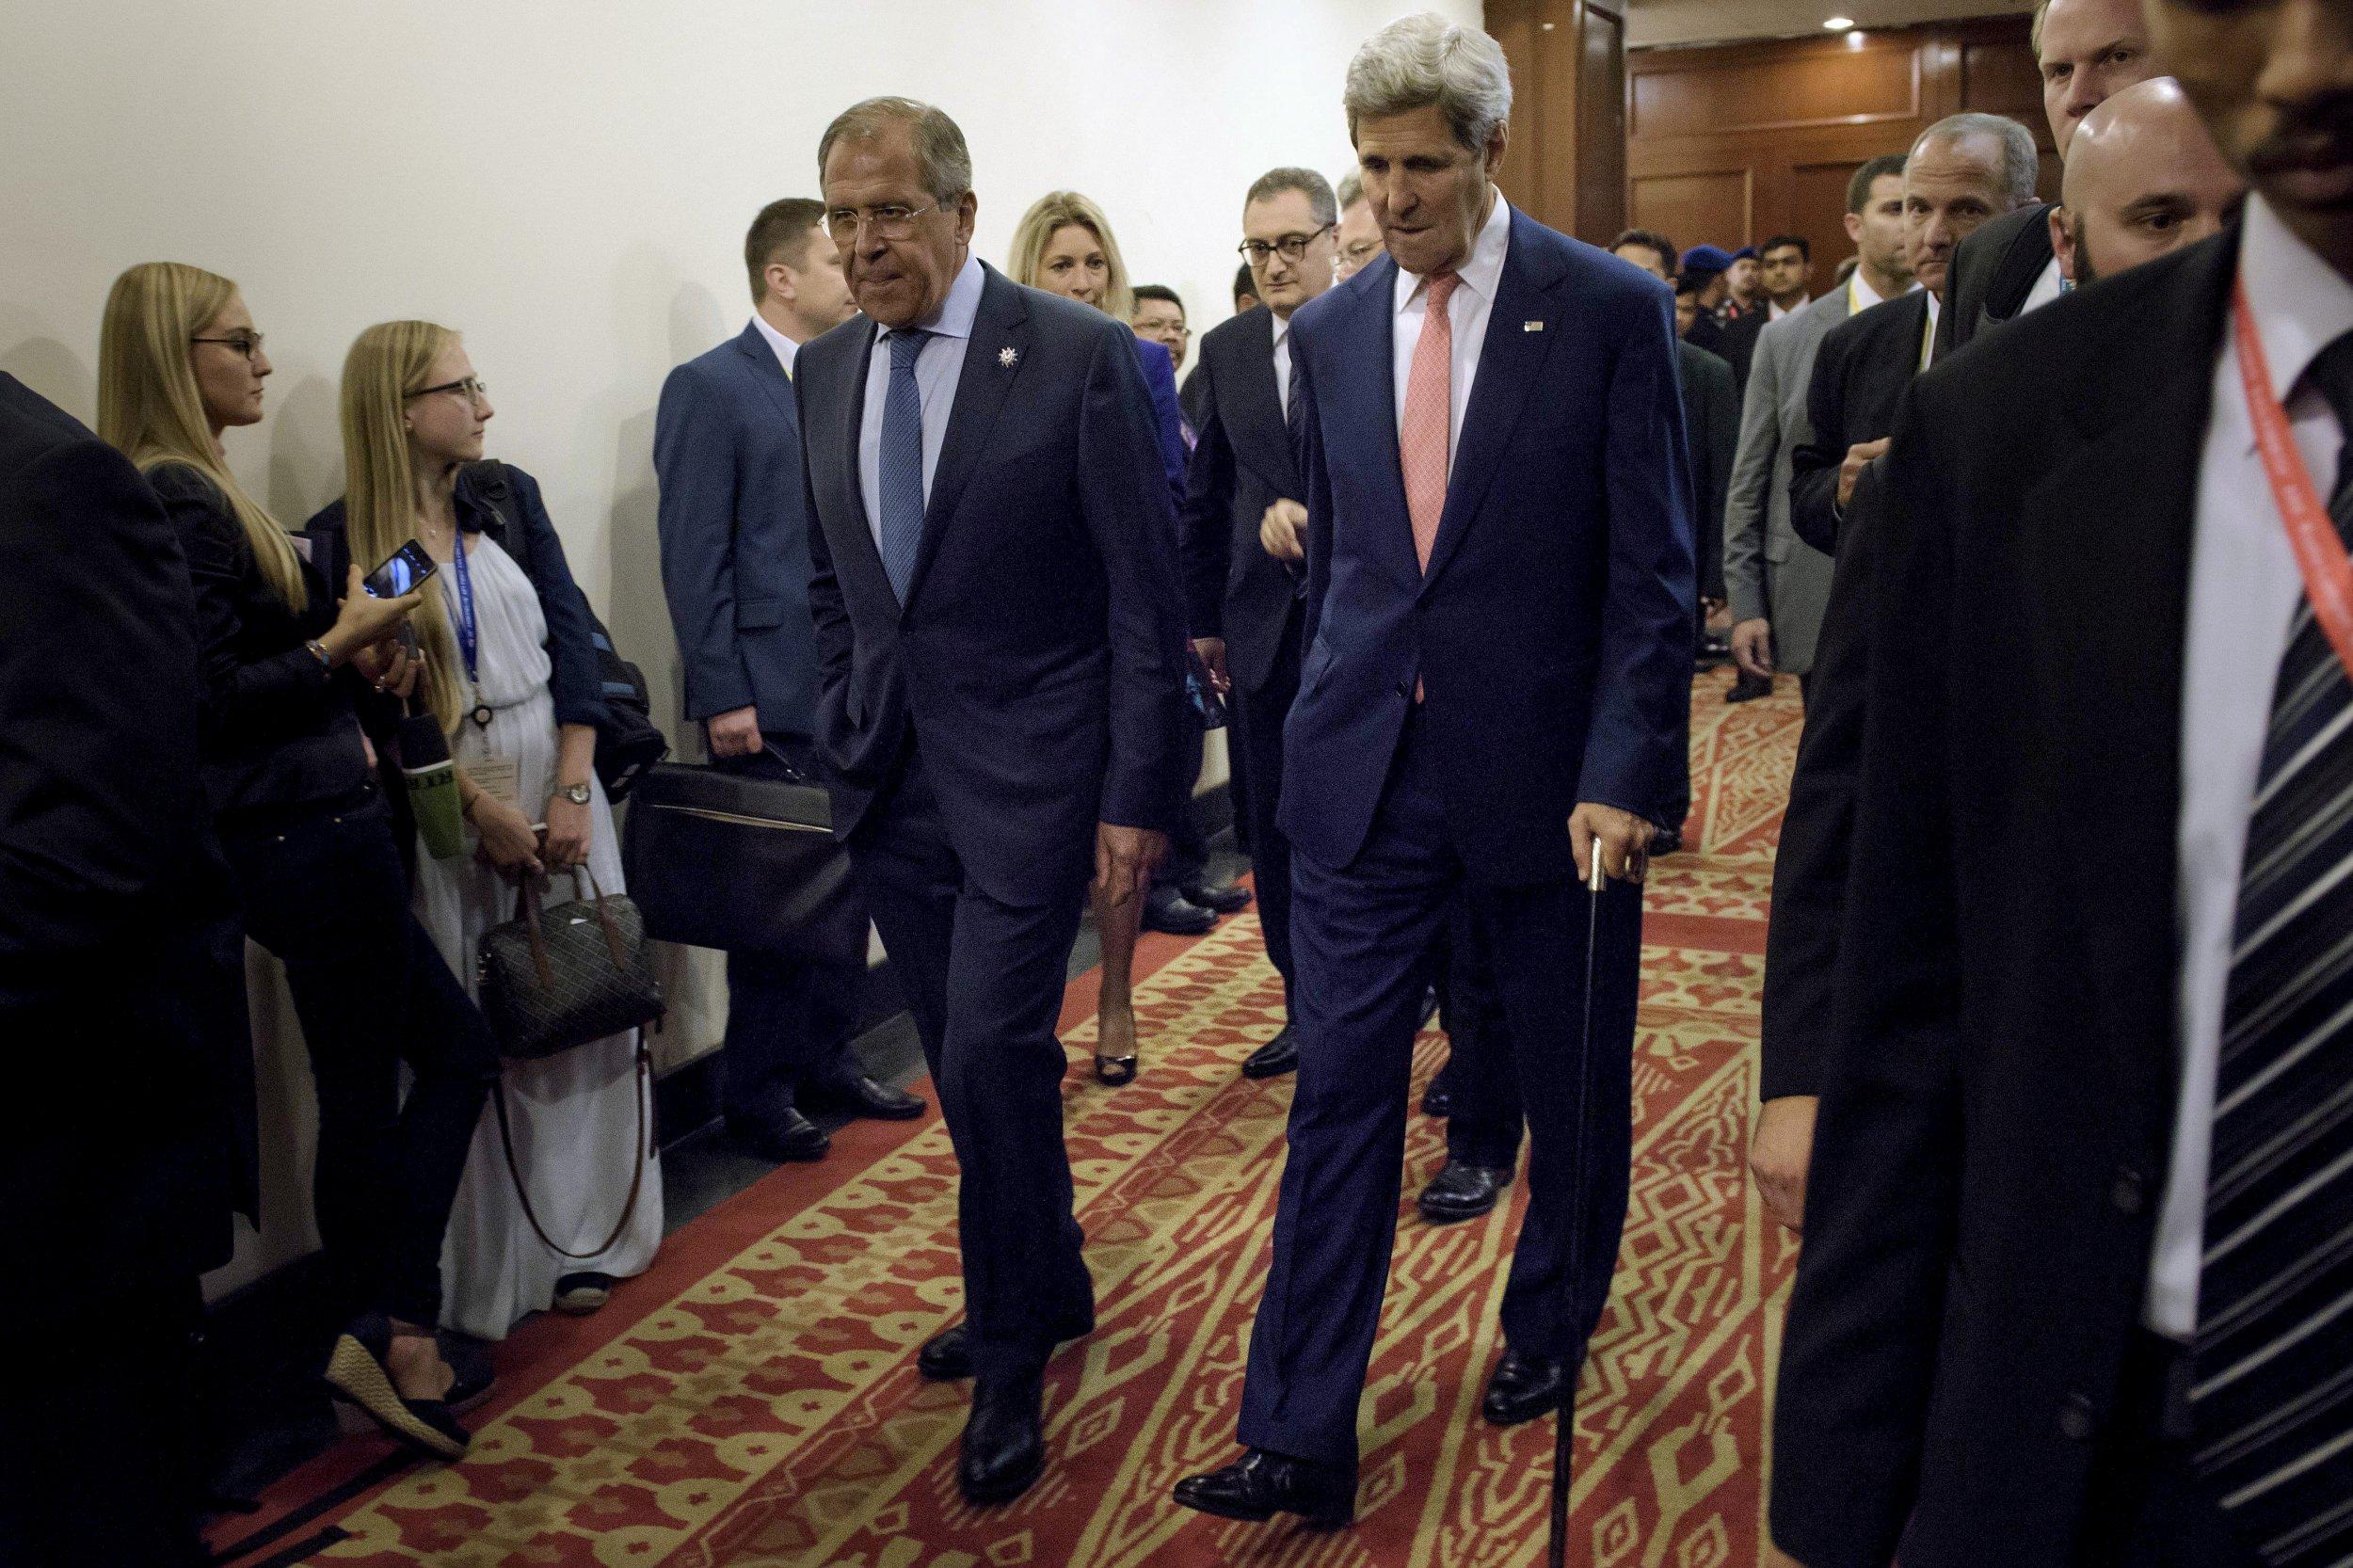 8/13/2015_RussiaUSSyria